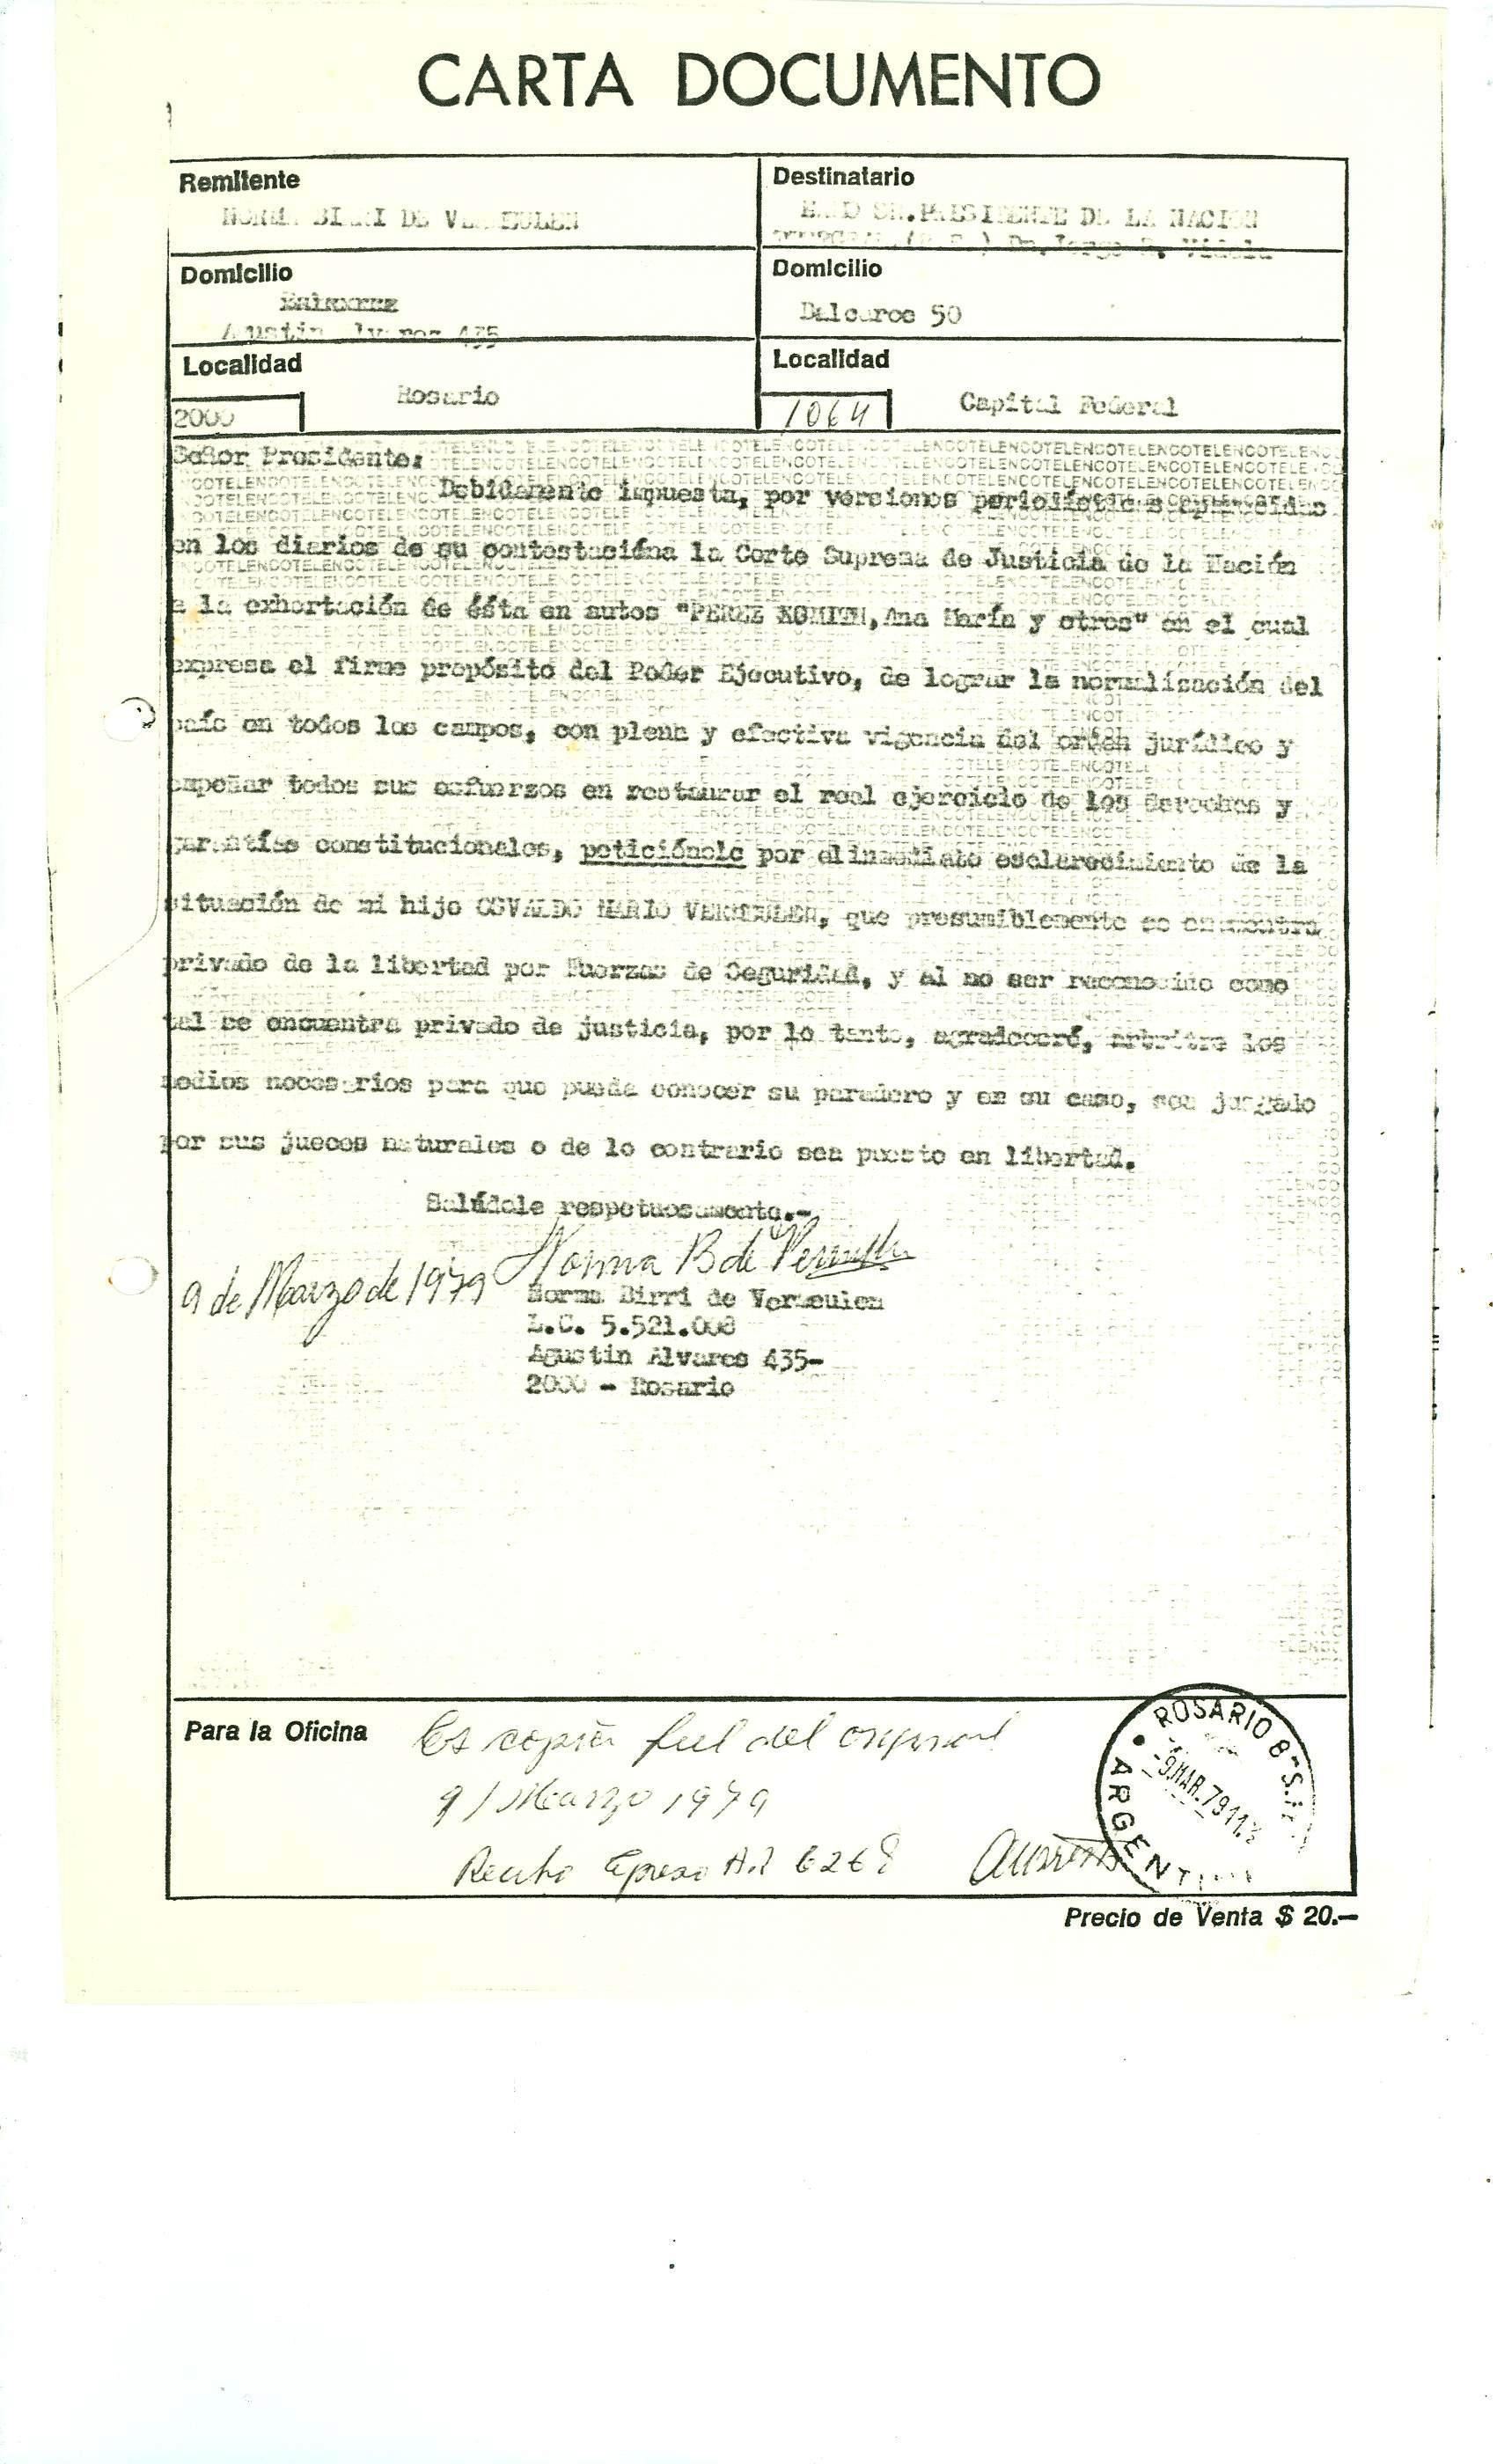 Carta documento Norma al Presidente 1979